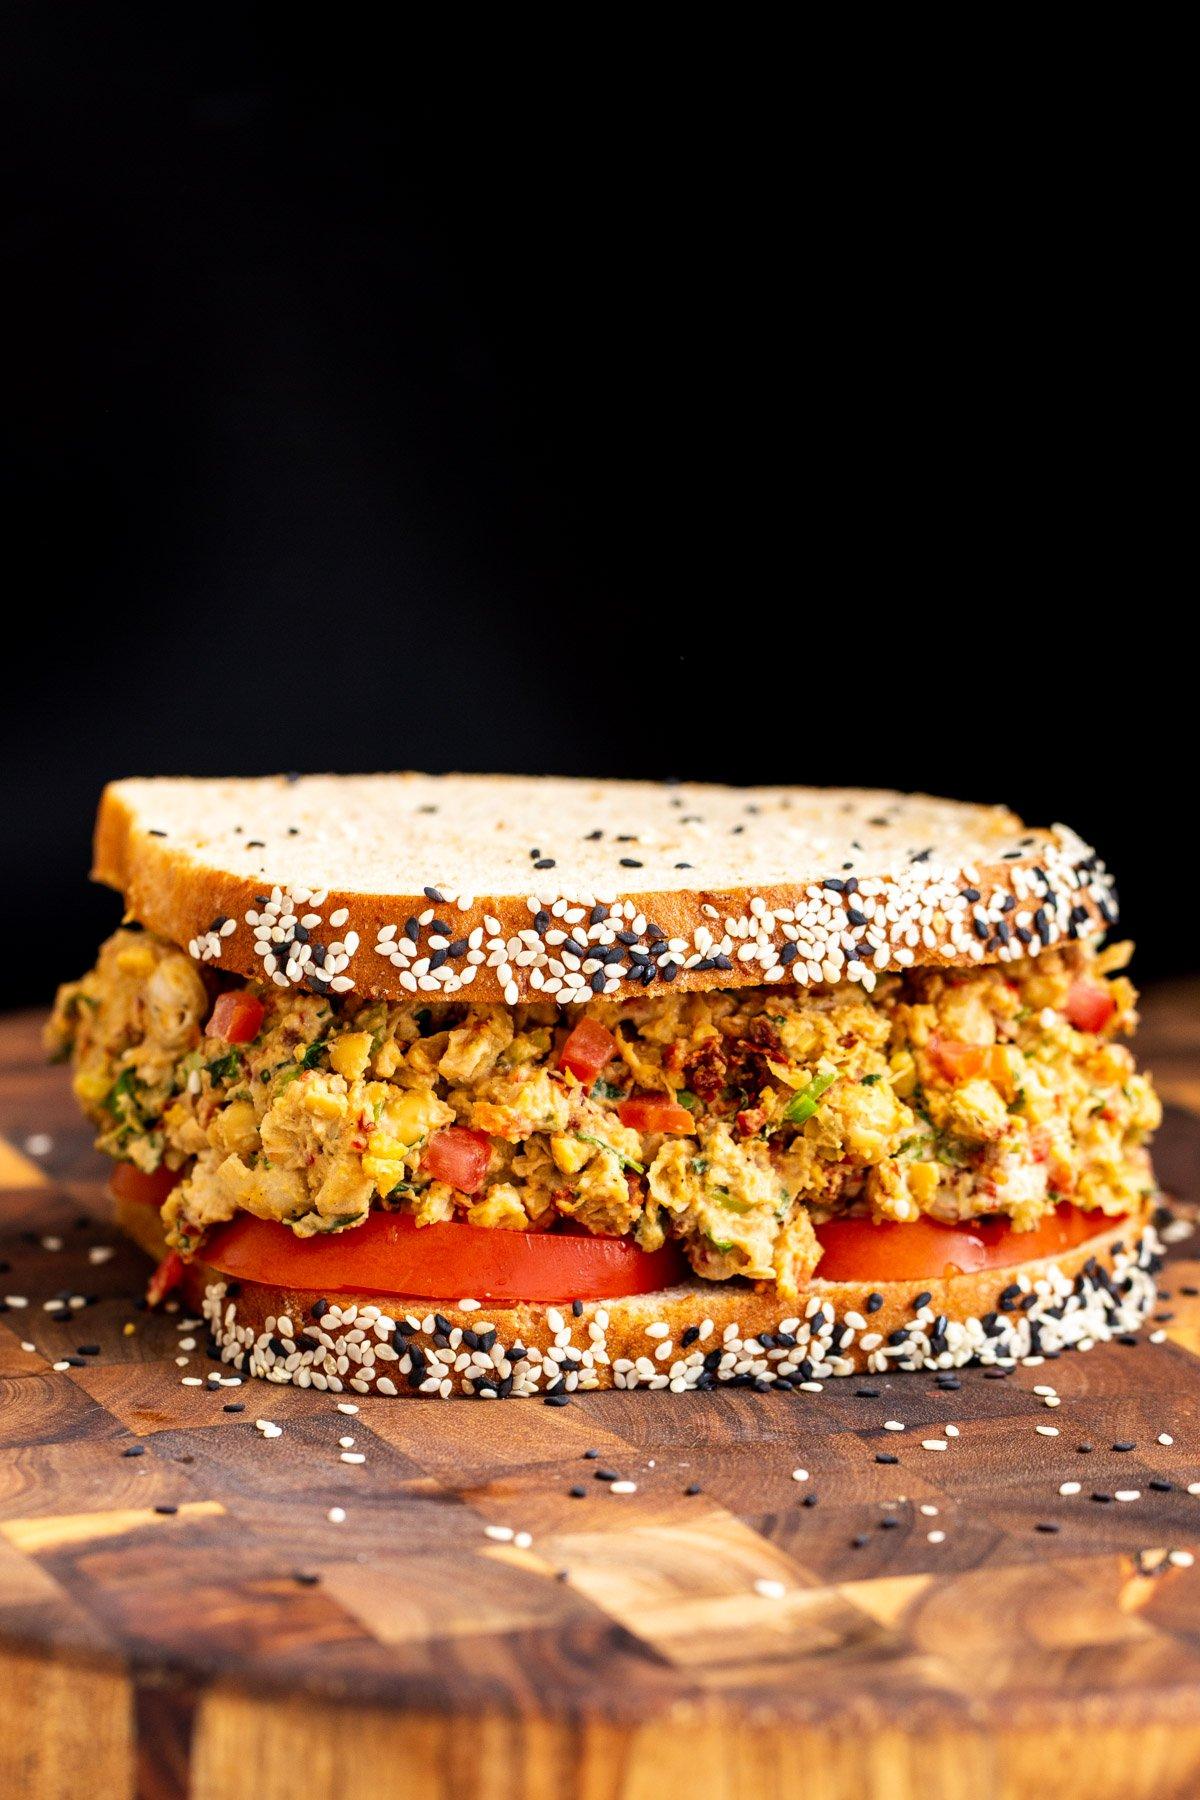 vegan Mediterranean chickpea salad sandwich on multigrain bread served on a wooden board